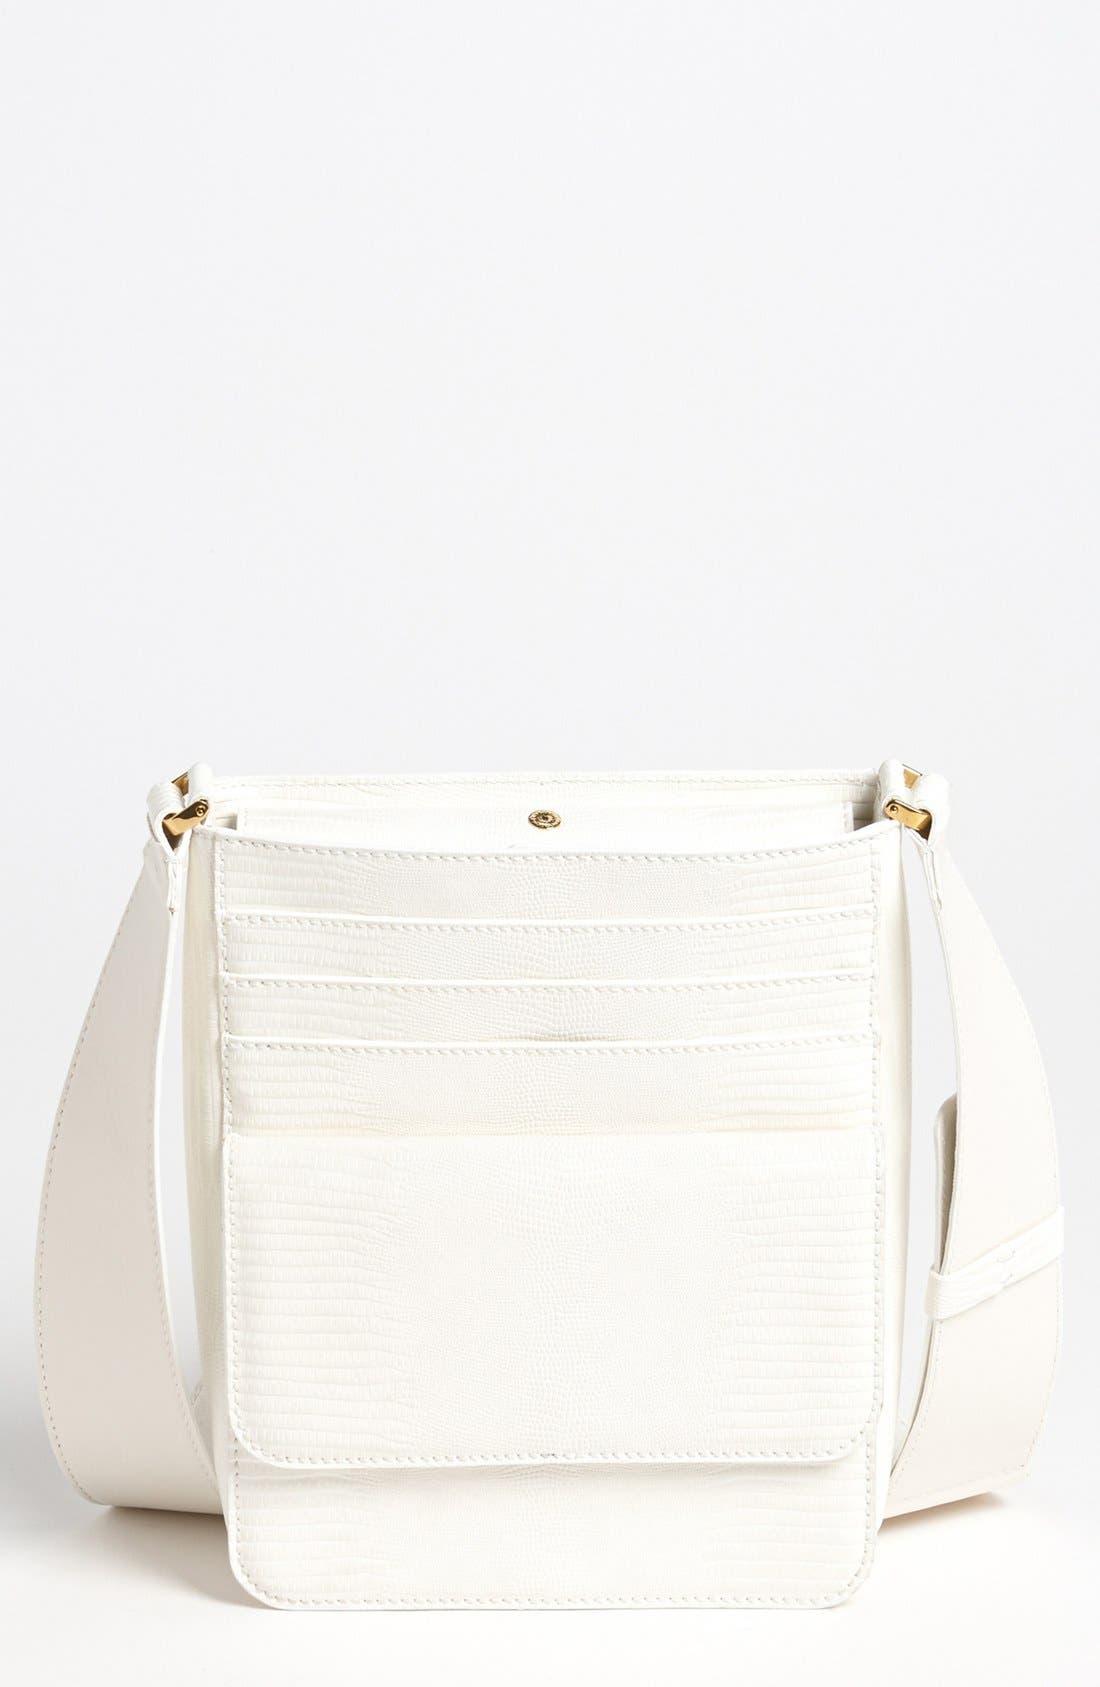 Main Image - Stella McCartney 'Tejus' Faux Leather Crossbody Bag, Small